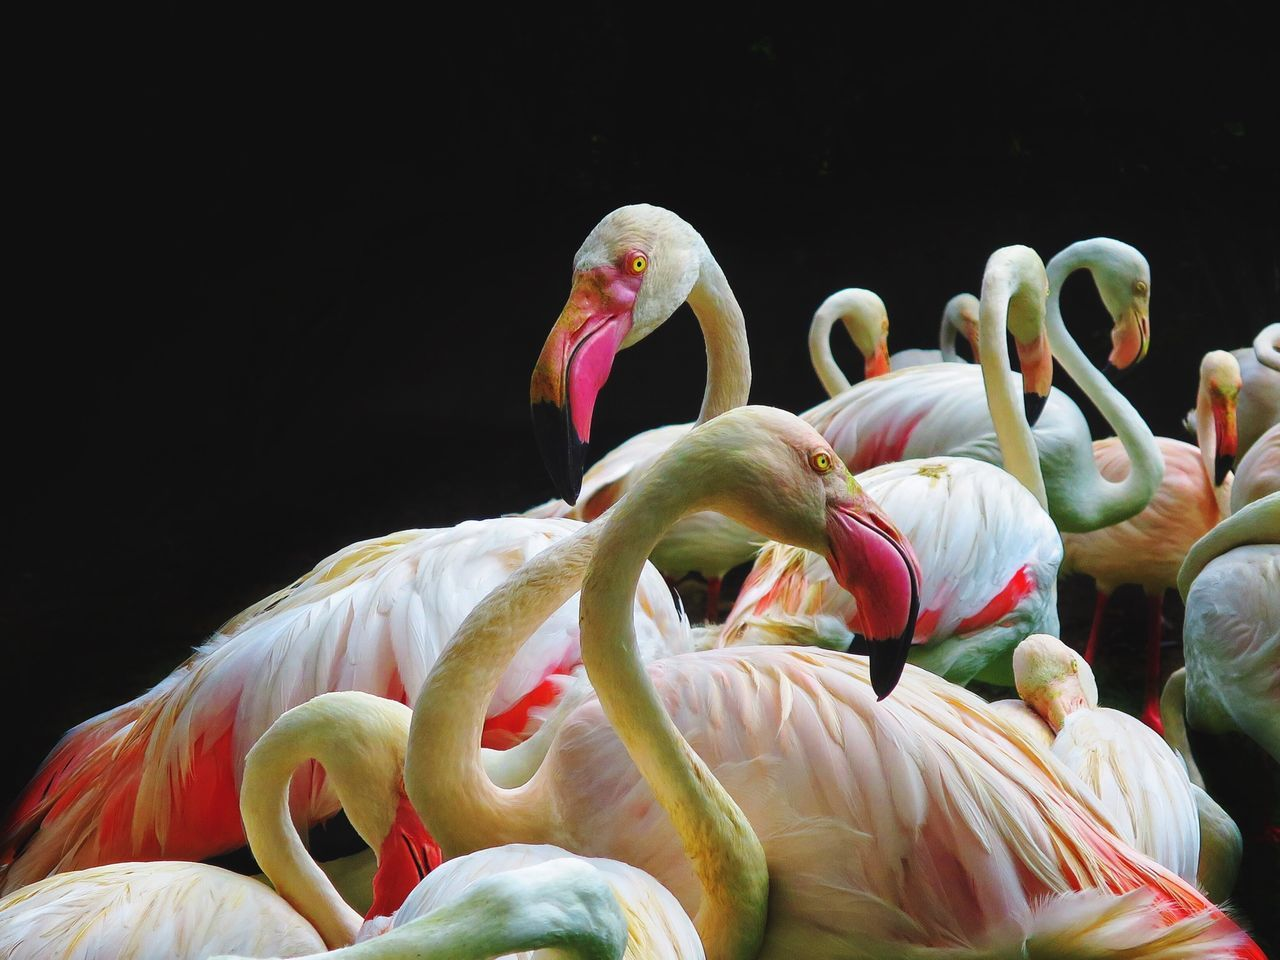 Flamingos against black background